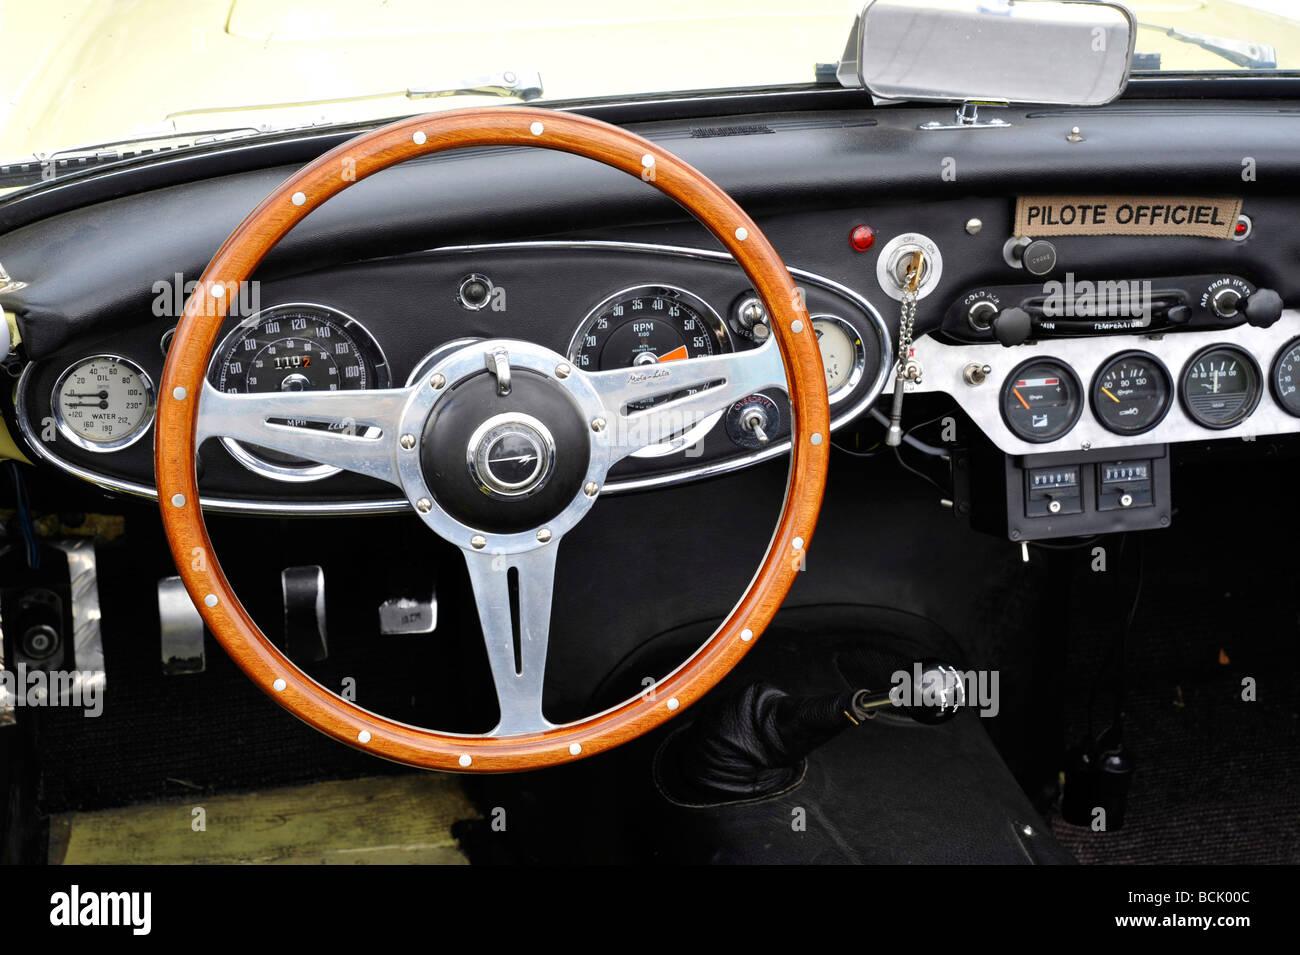 1960 Austin Healey 3000 mk1 Cockpit Innenaufnahme Stockbild